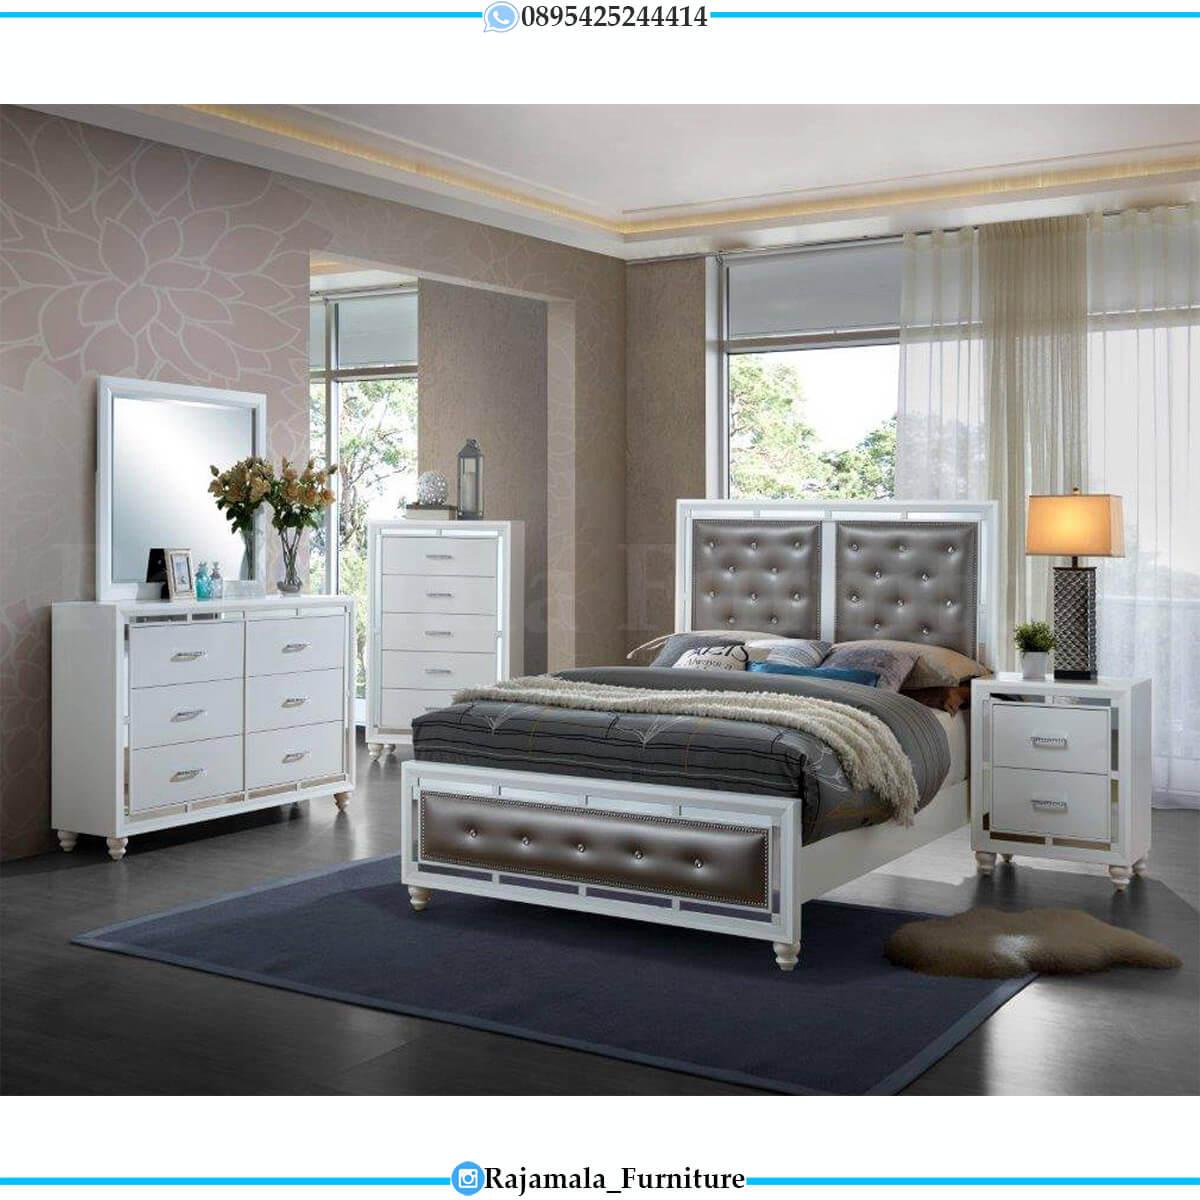 Jual Tempat Tidur Minimalis Putih Duco Classic Luxury RM-0686